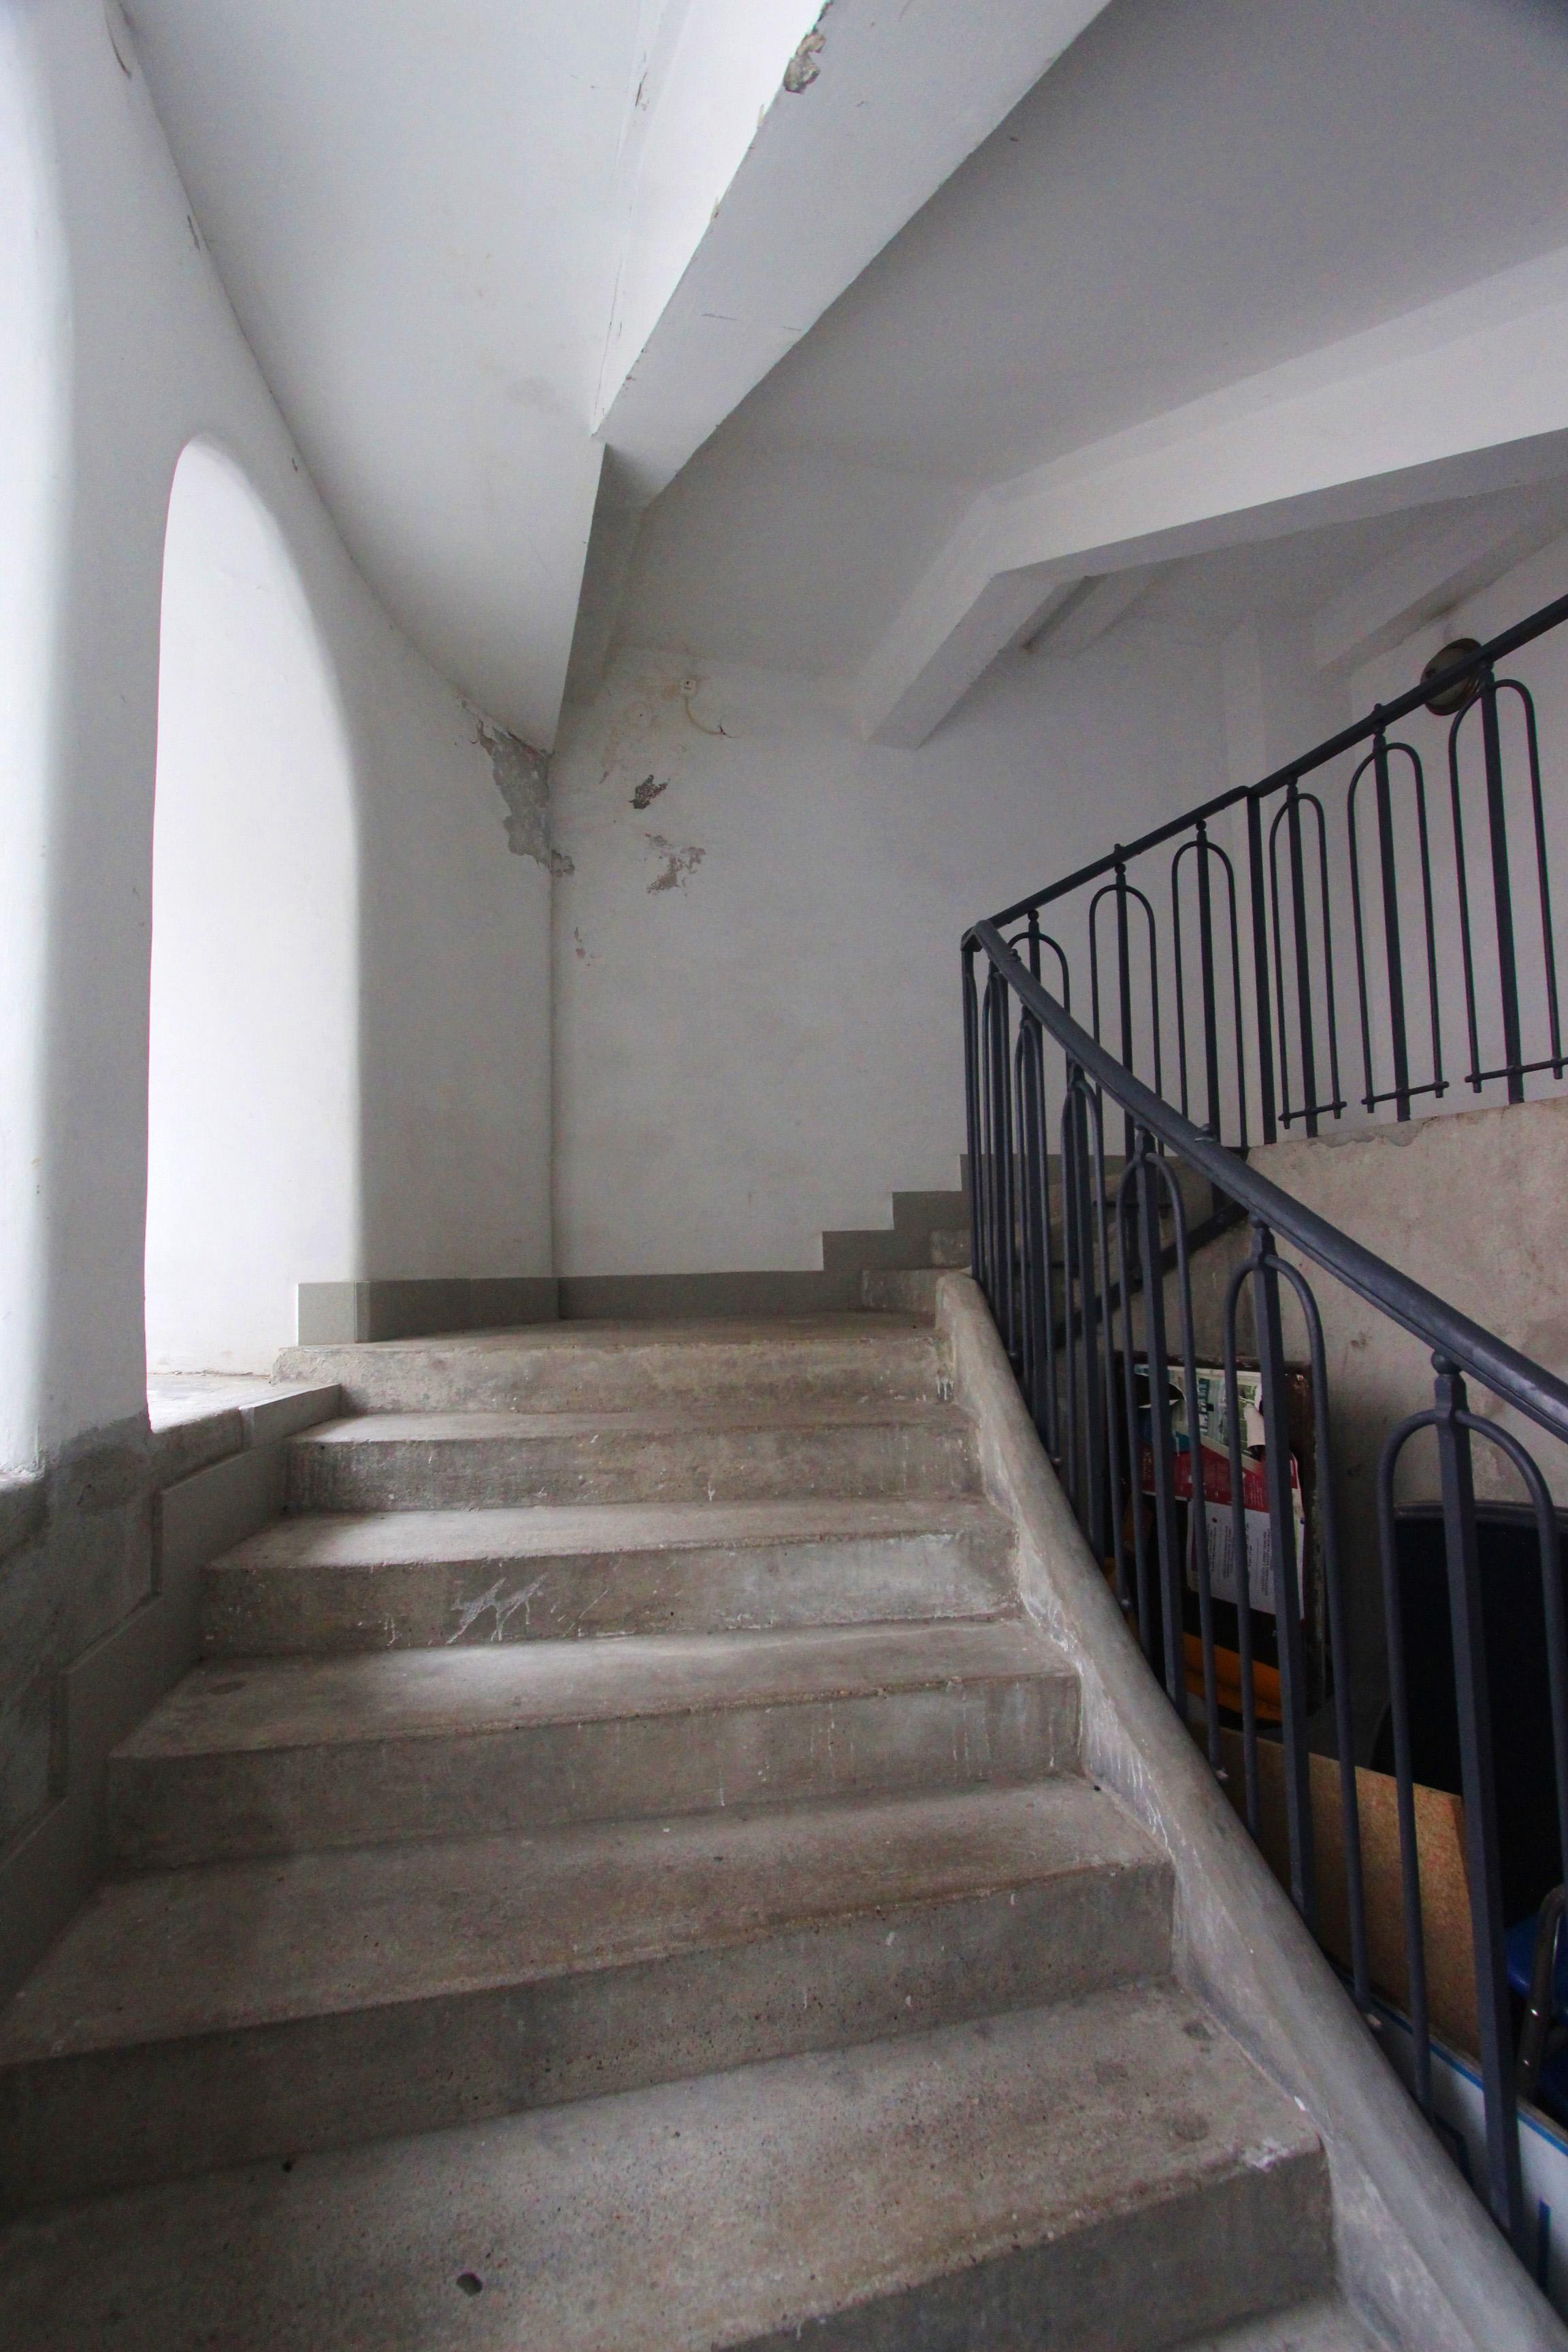 Kazinczy utcai zsinagóga belülről